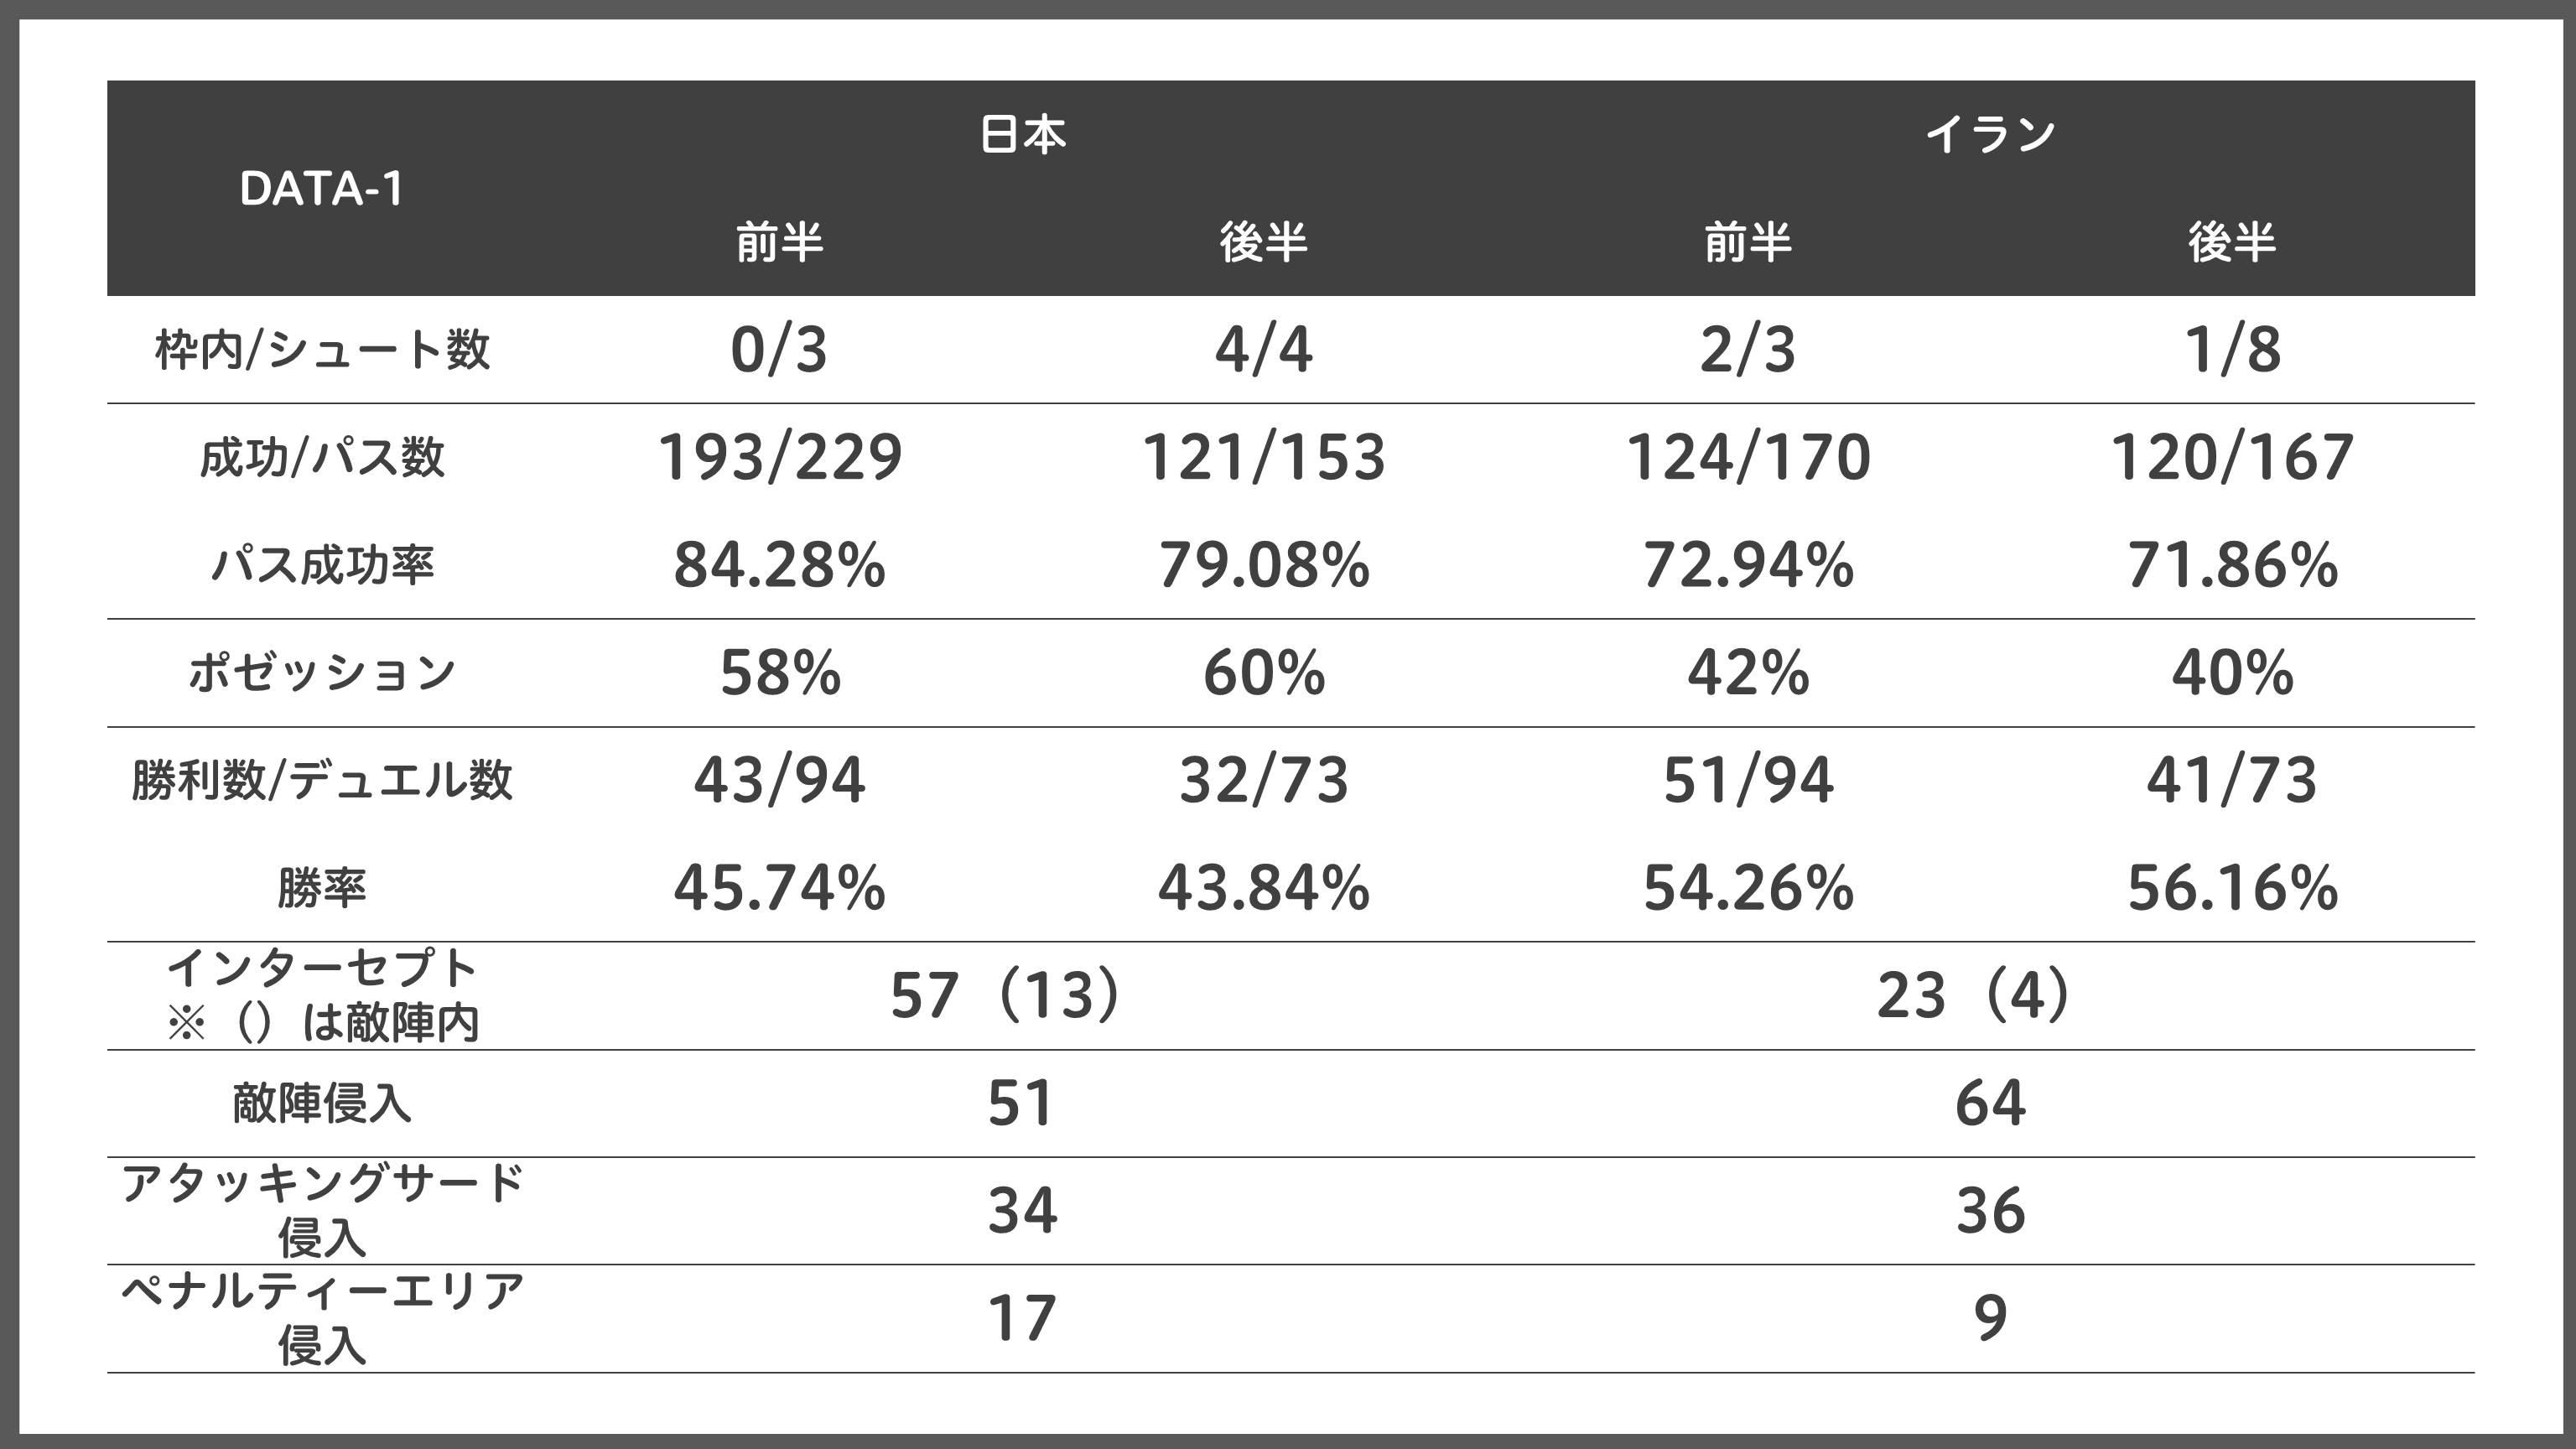 [DATA-1]日本とイランの試合スタッツ【表:Evolving Data】